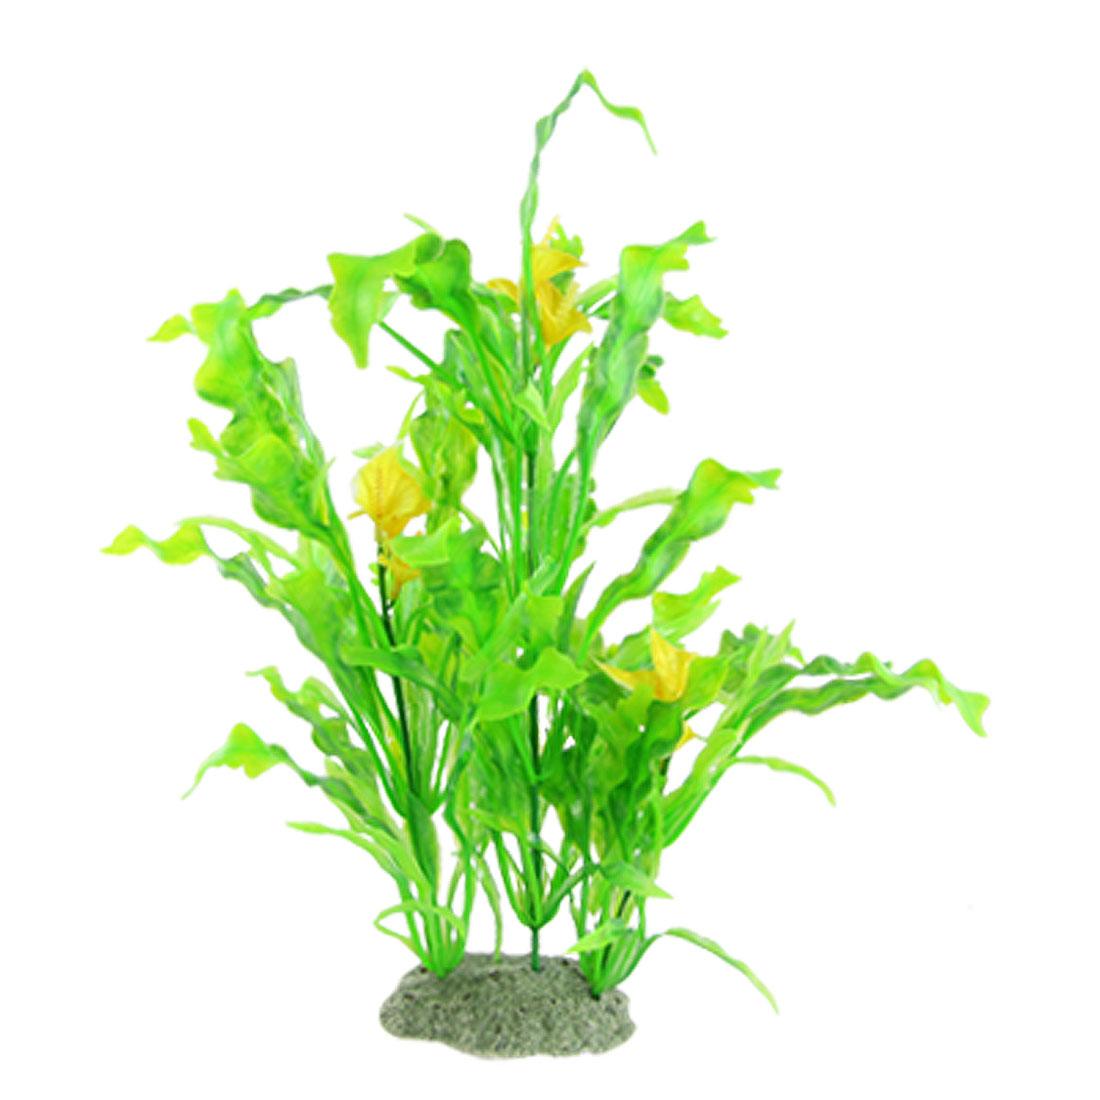 Yellow Flower Green Leaf Plastic Plant Aquarium Ornament